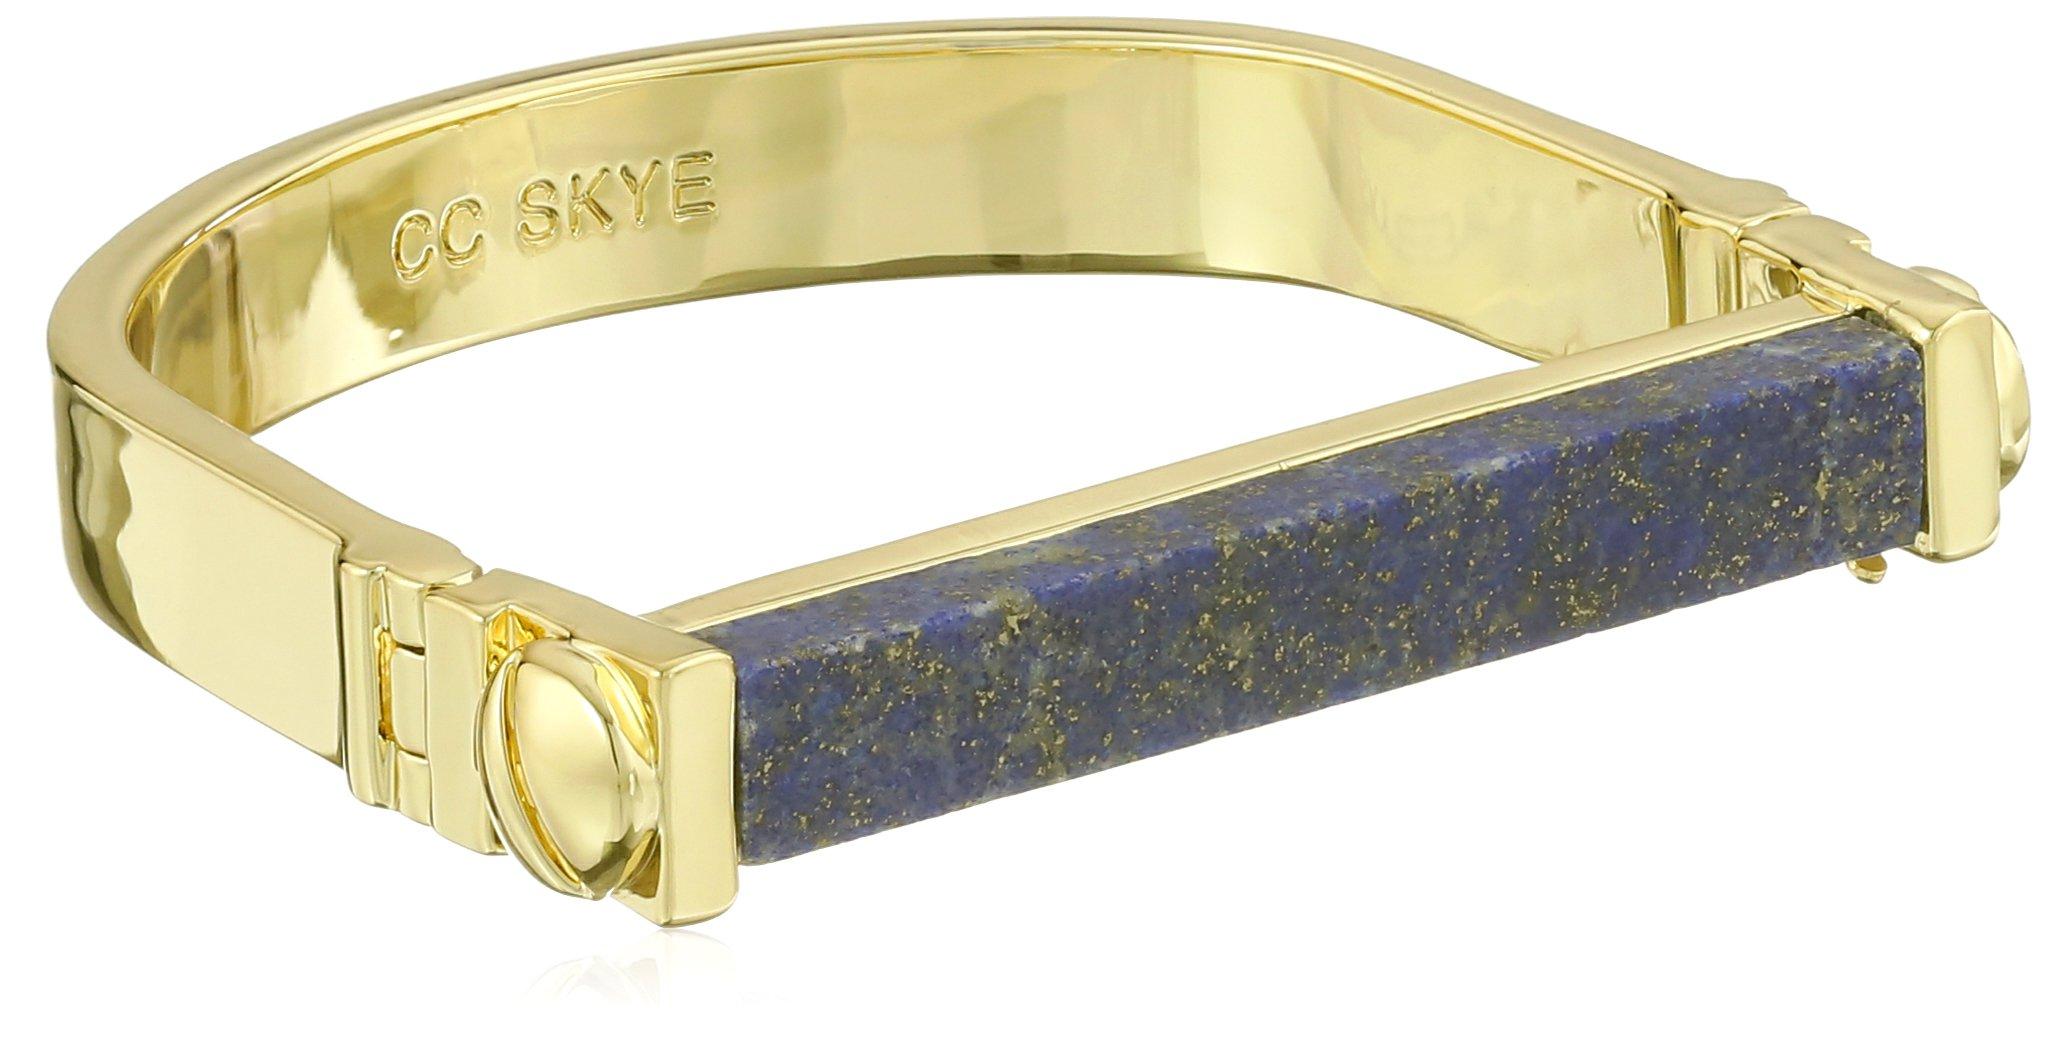 CC Skye Gold and Lapis Mesa Cuff Bracelet